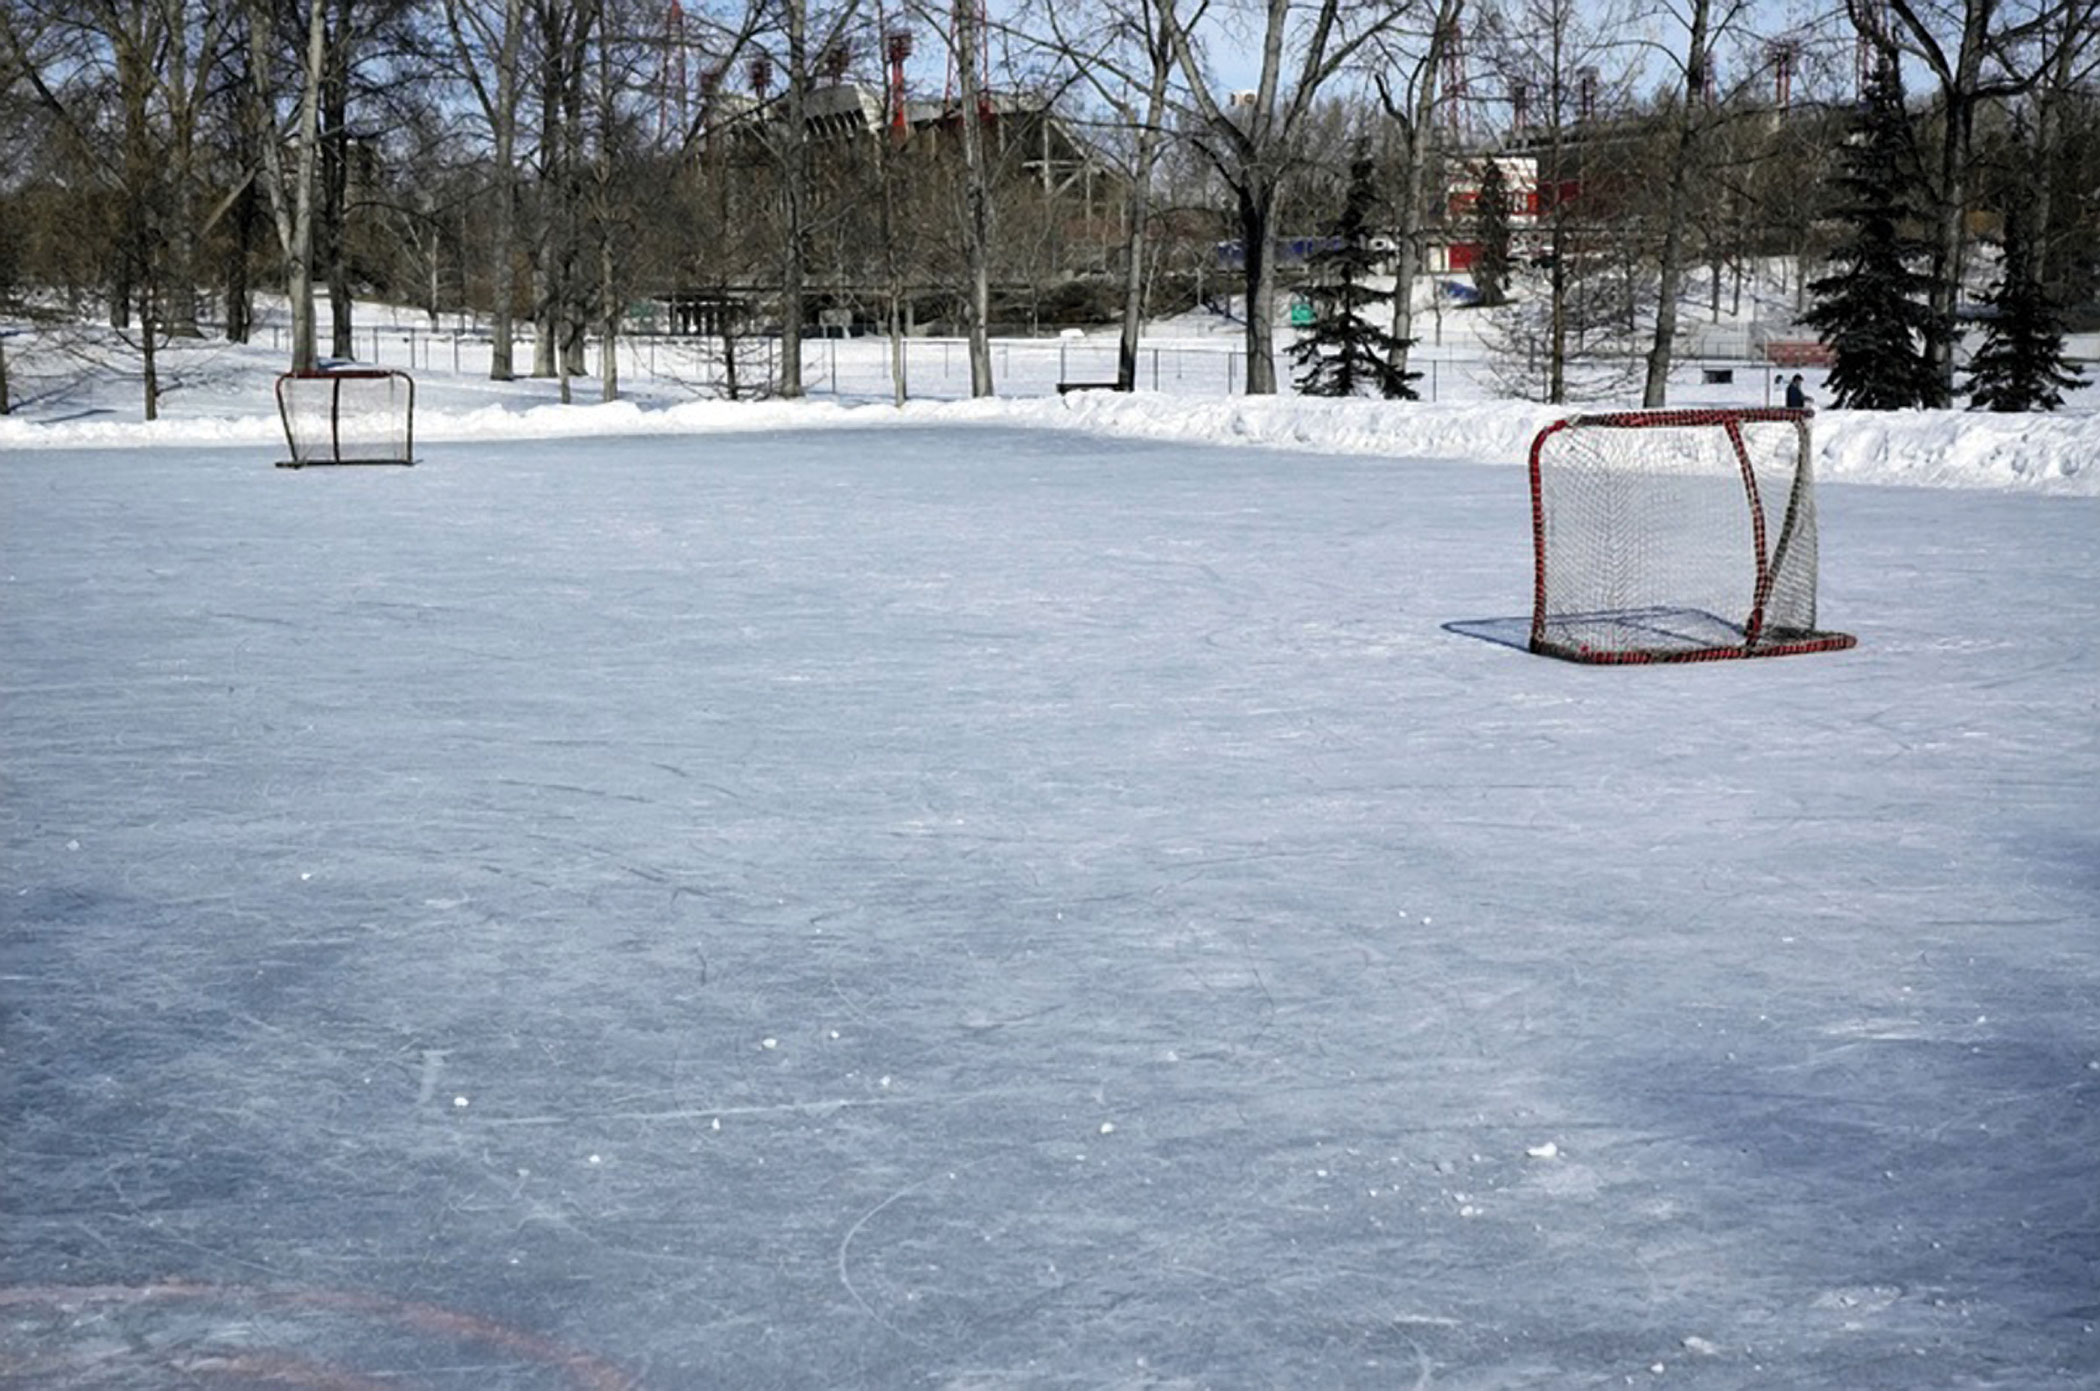 the ice rink Weylon Heiser built for his sons